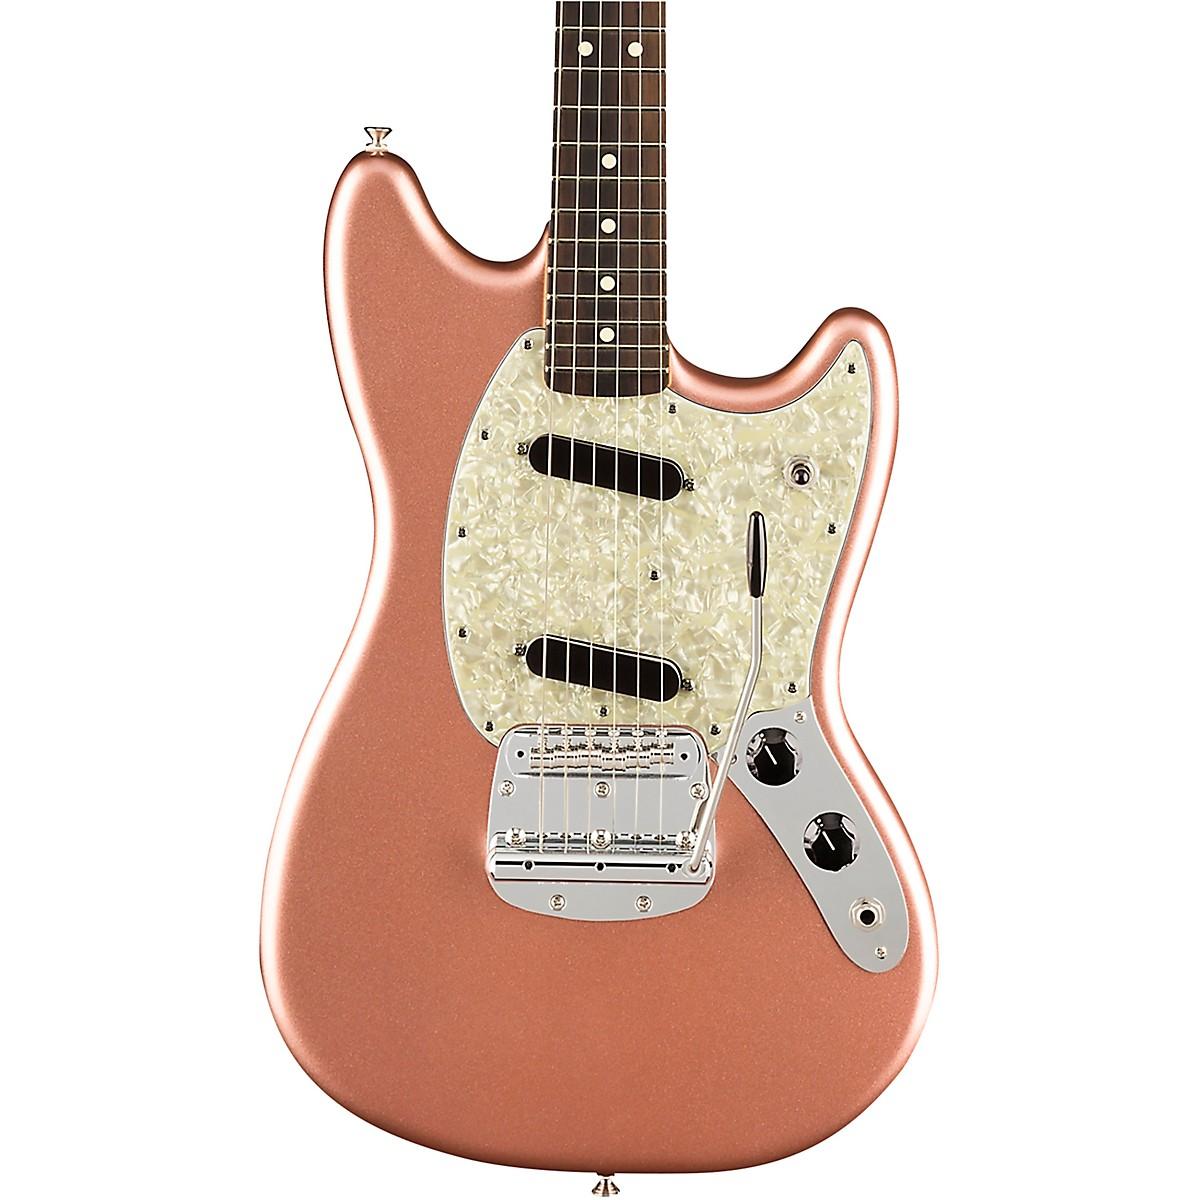 Fender American Performer Mustang Rosewood Fingerboard Electric Guitar